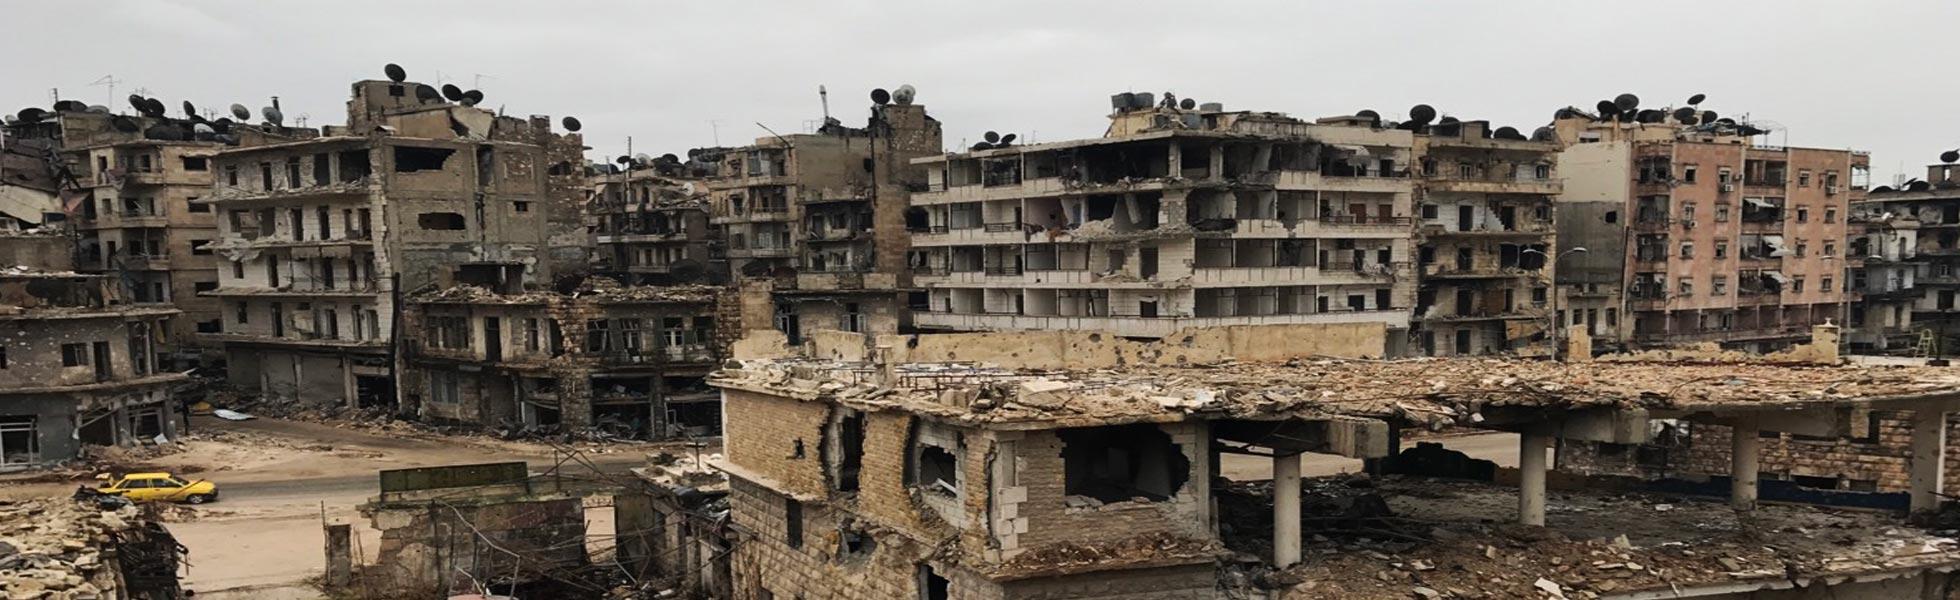 Jesuit priest calls for reconciliation in Aleppo